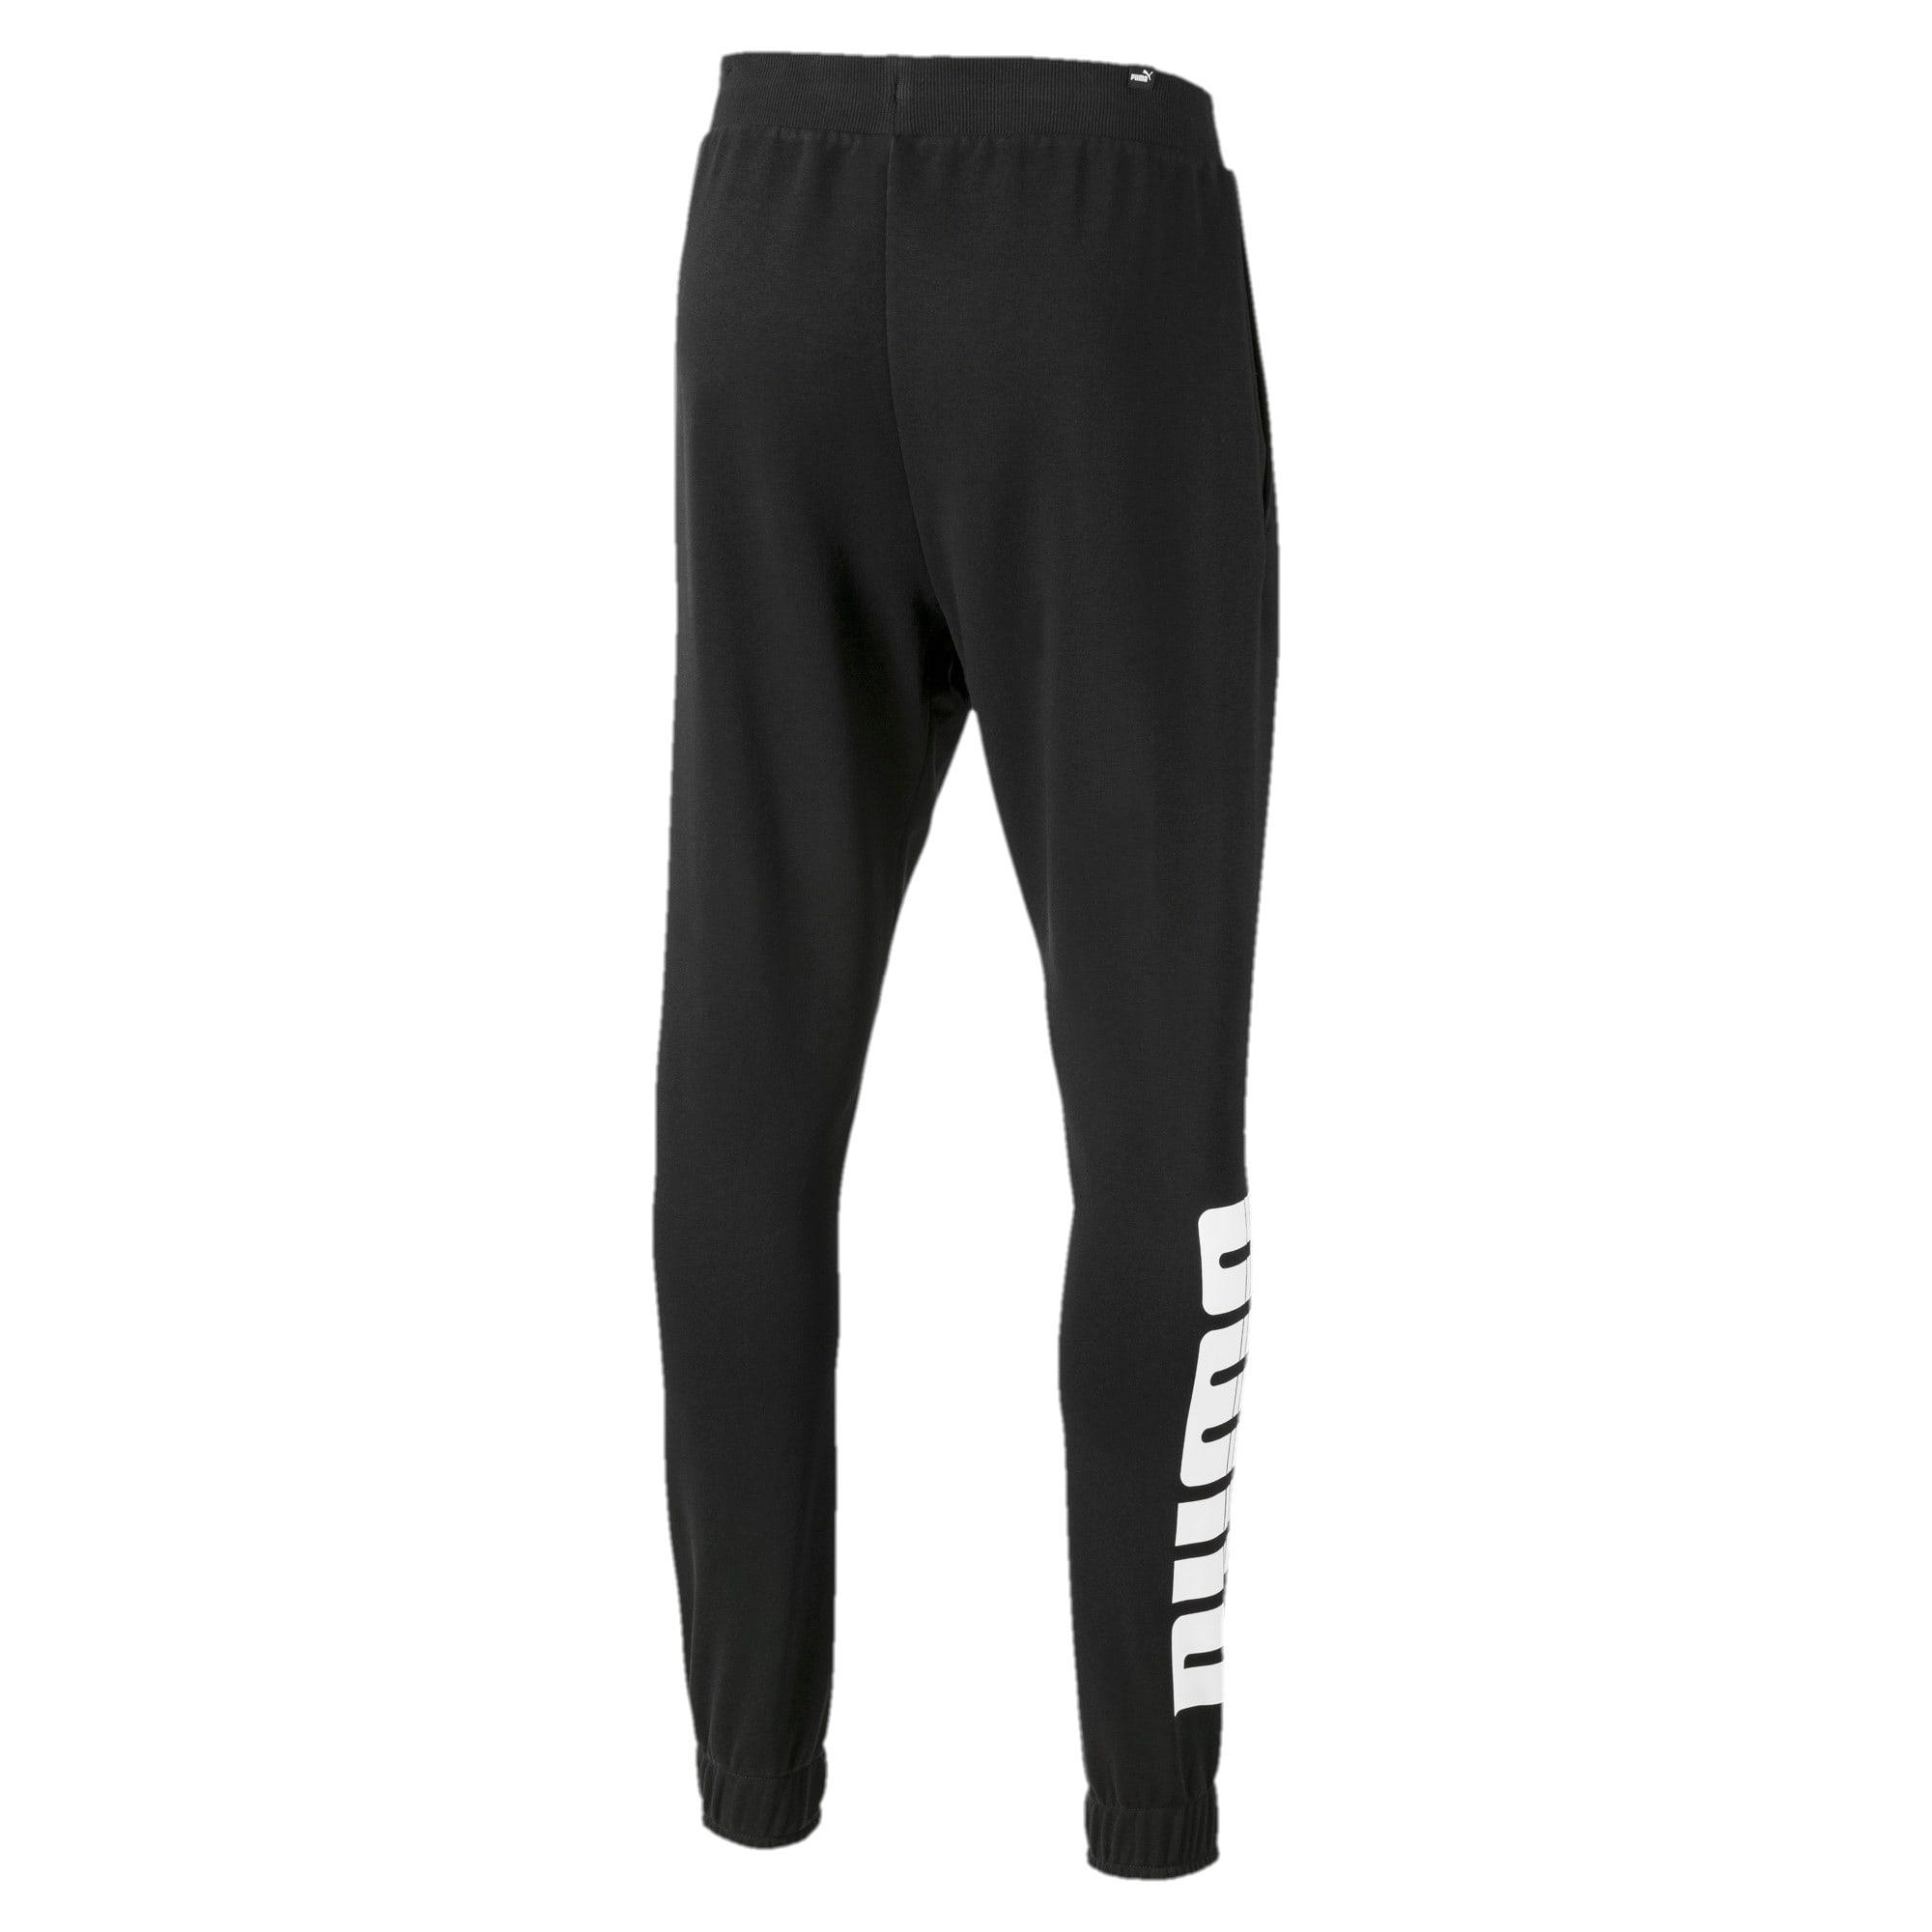 Thumbnail 5 of Rebel Bold Men's Pants, Puma Black, medium